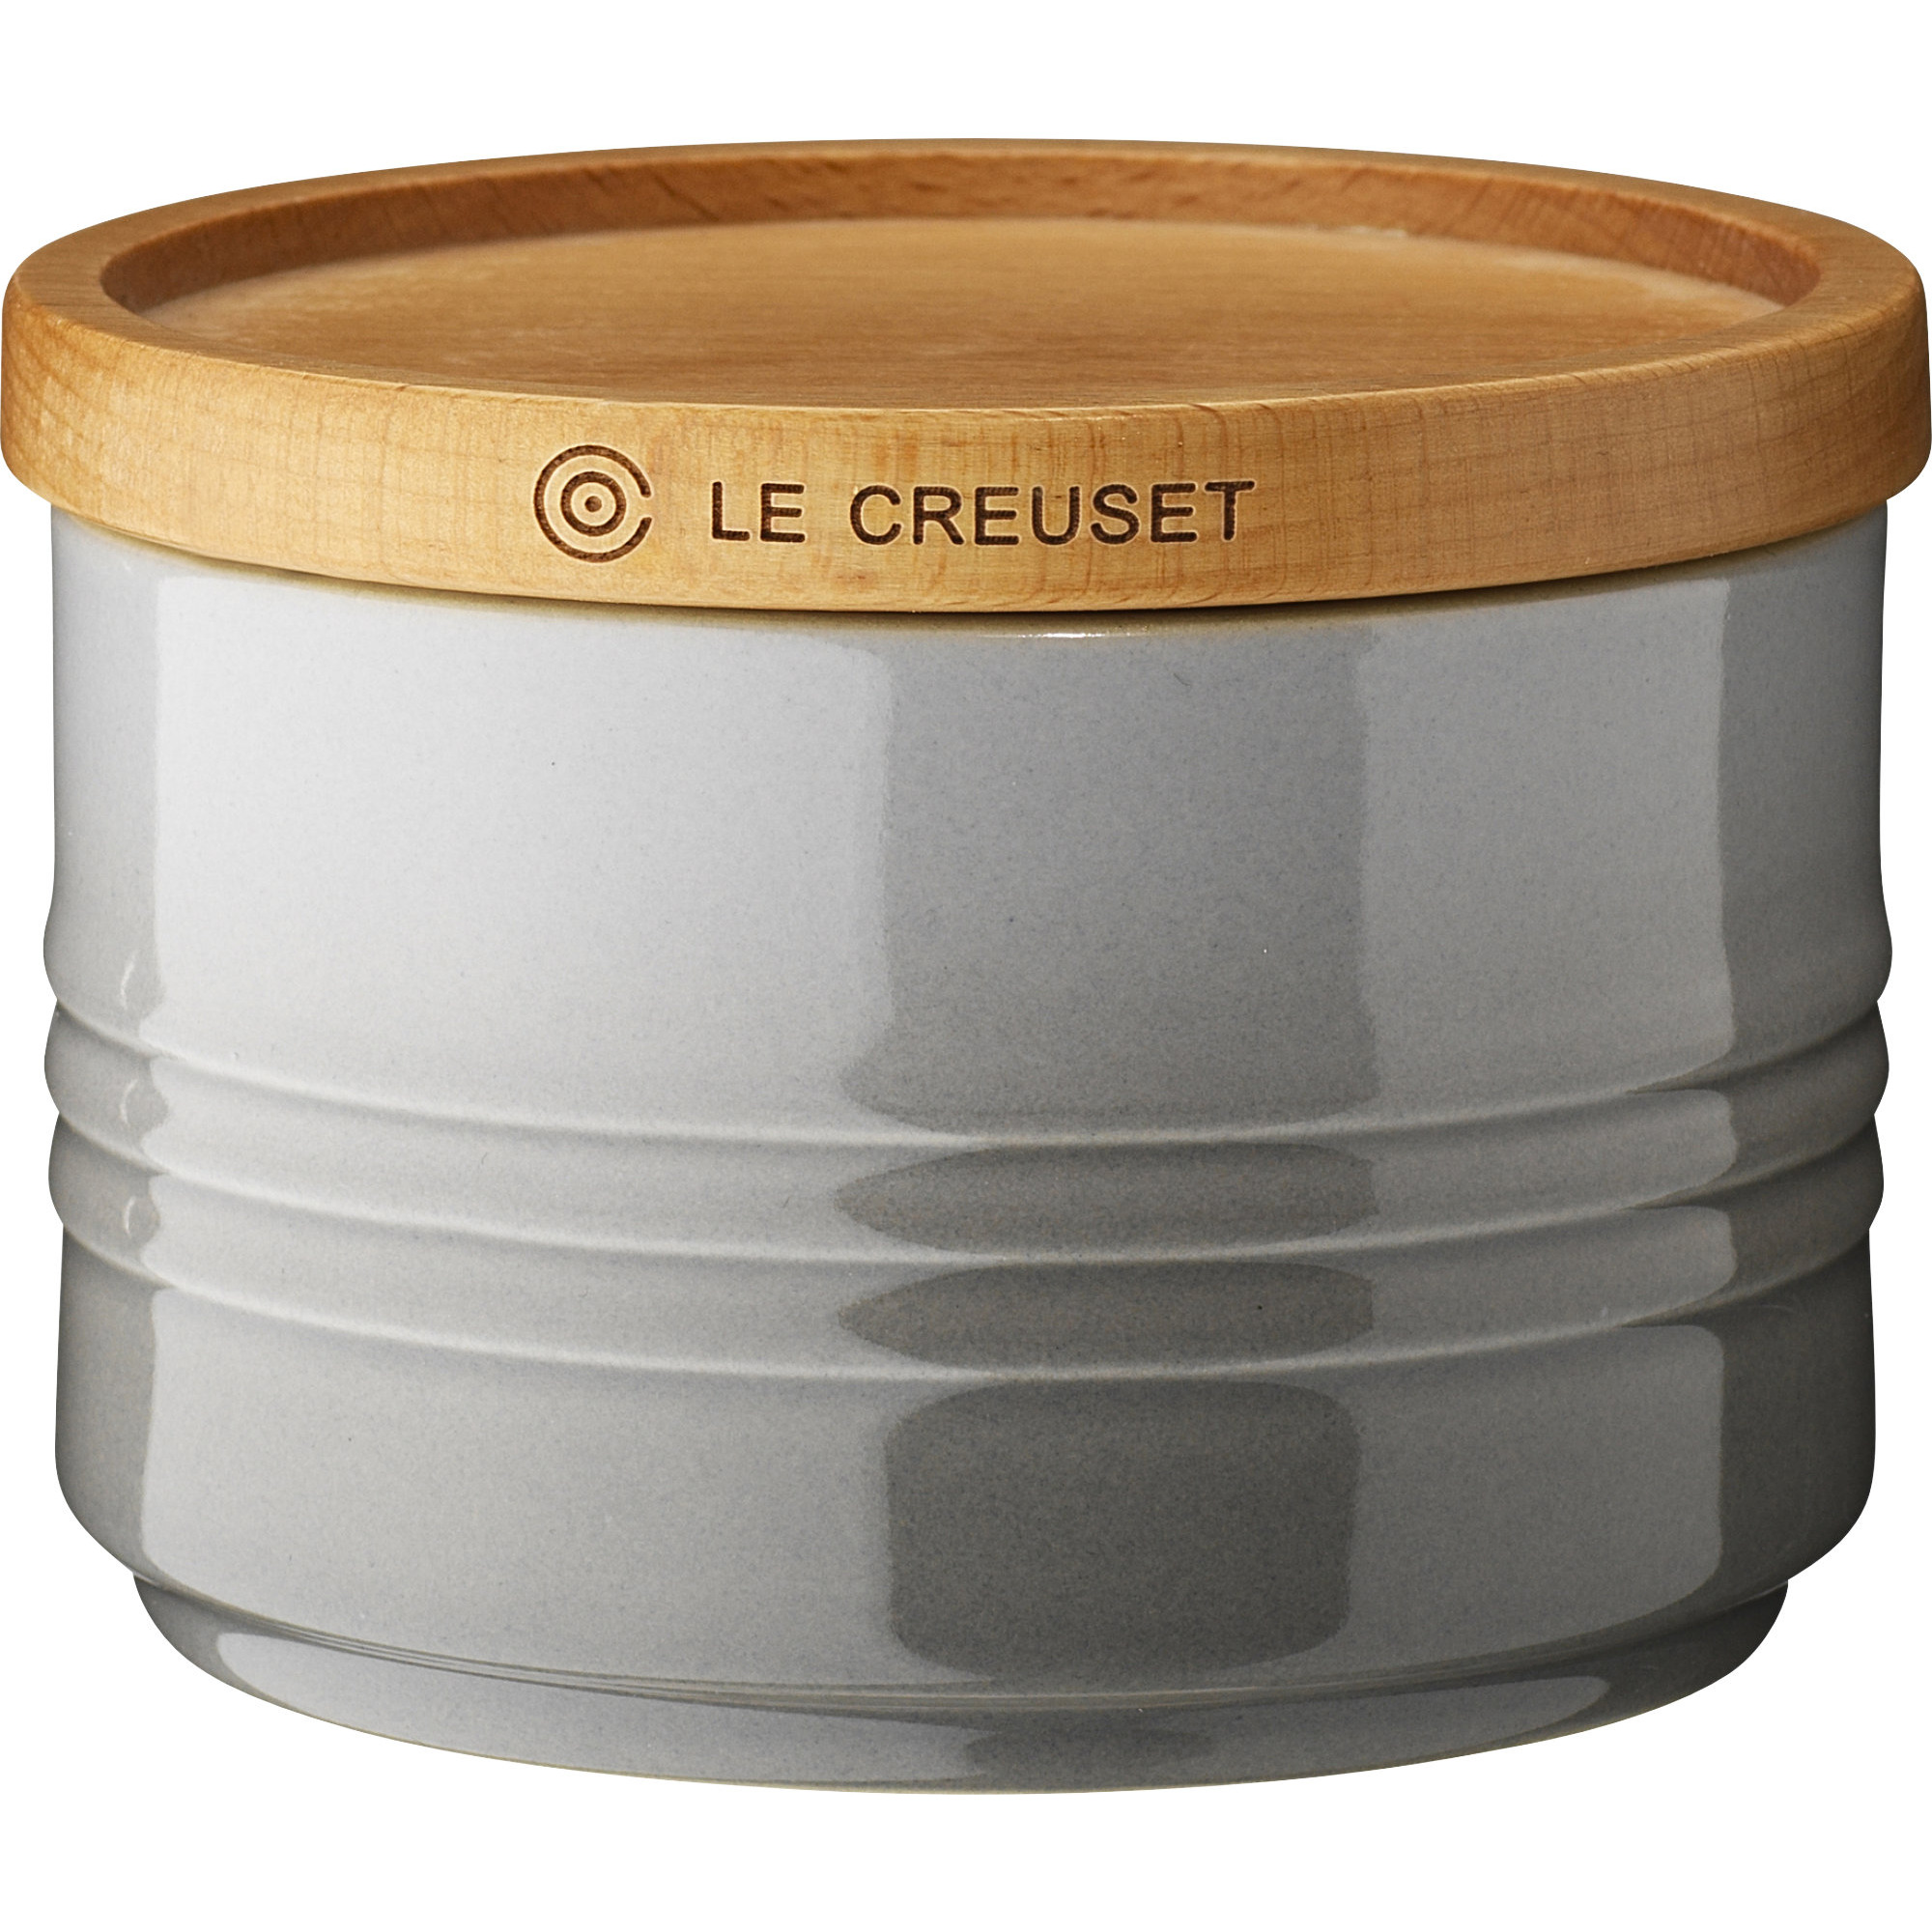 Le Creuset Förvaringsburk 034 L/10 cm Mist Gray Lmt. Ed